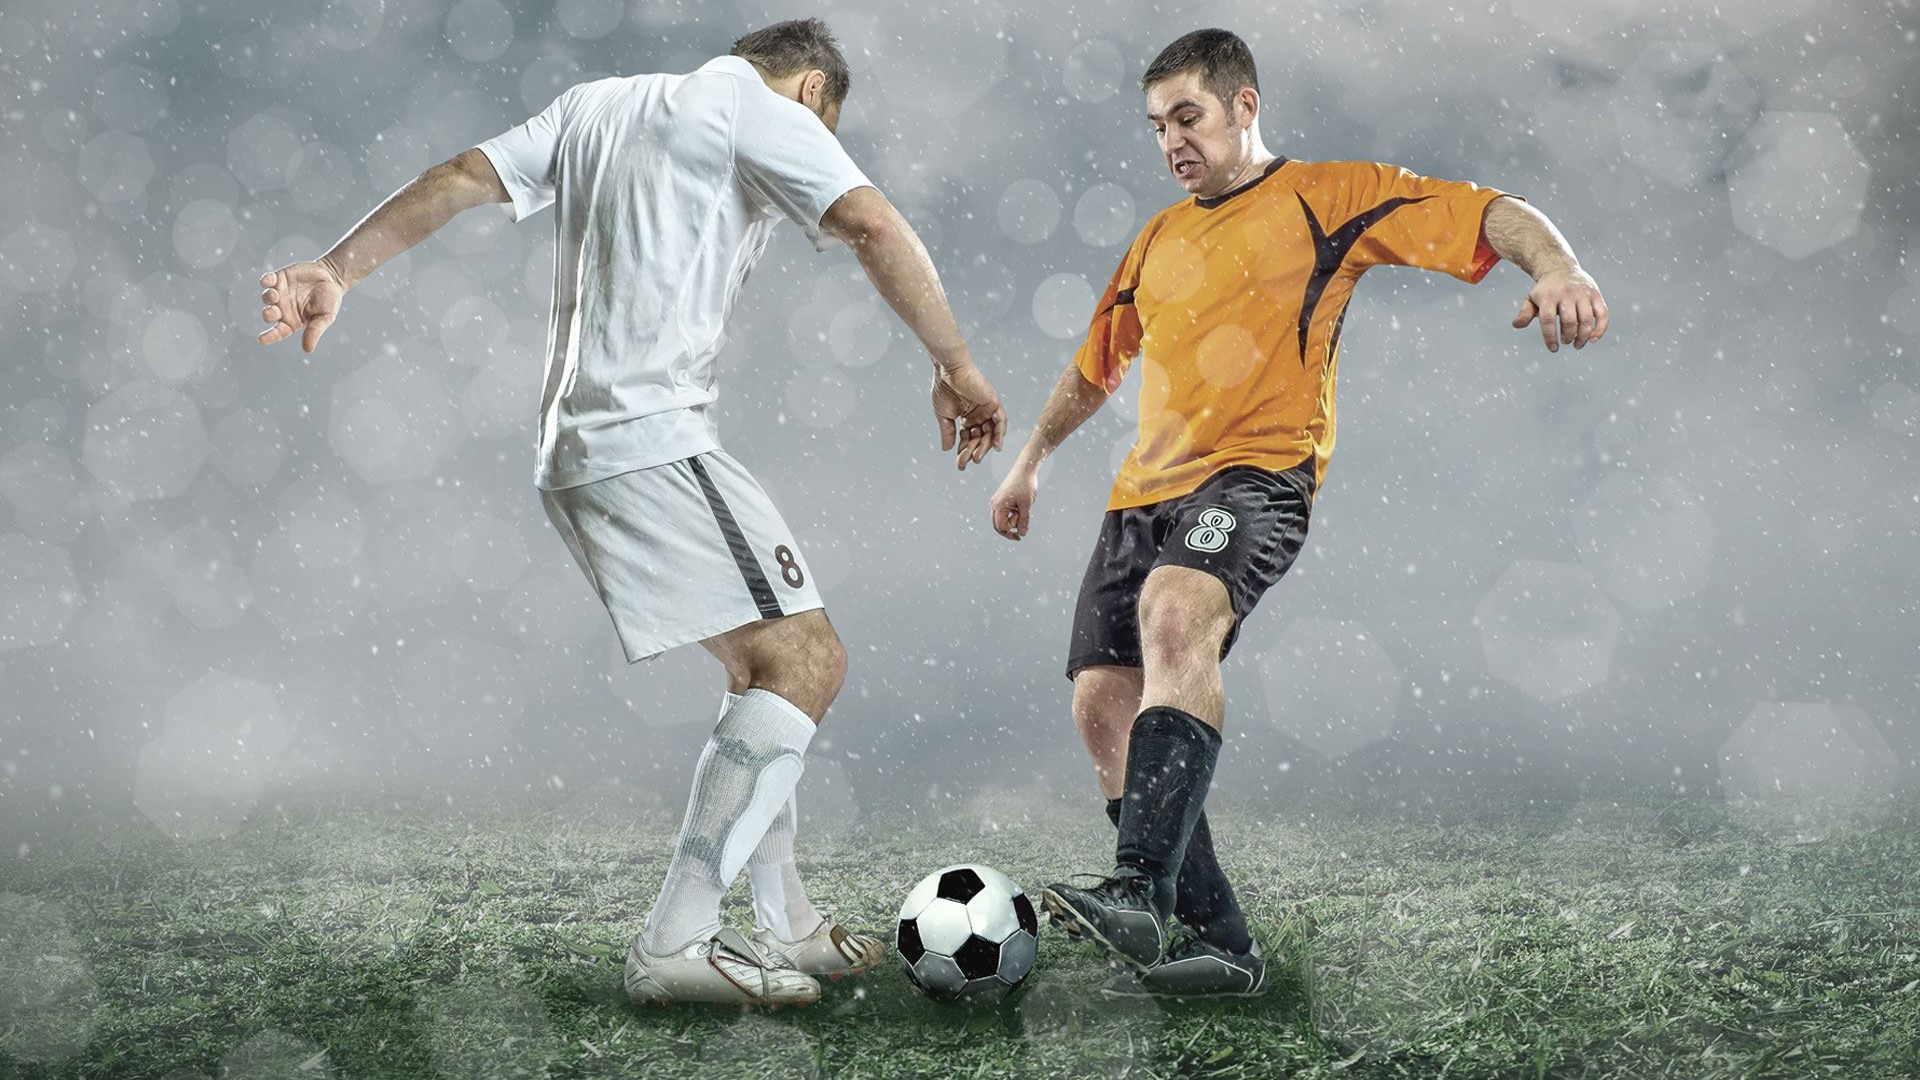 stormers-vs-highlanders-rugby-live